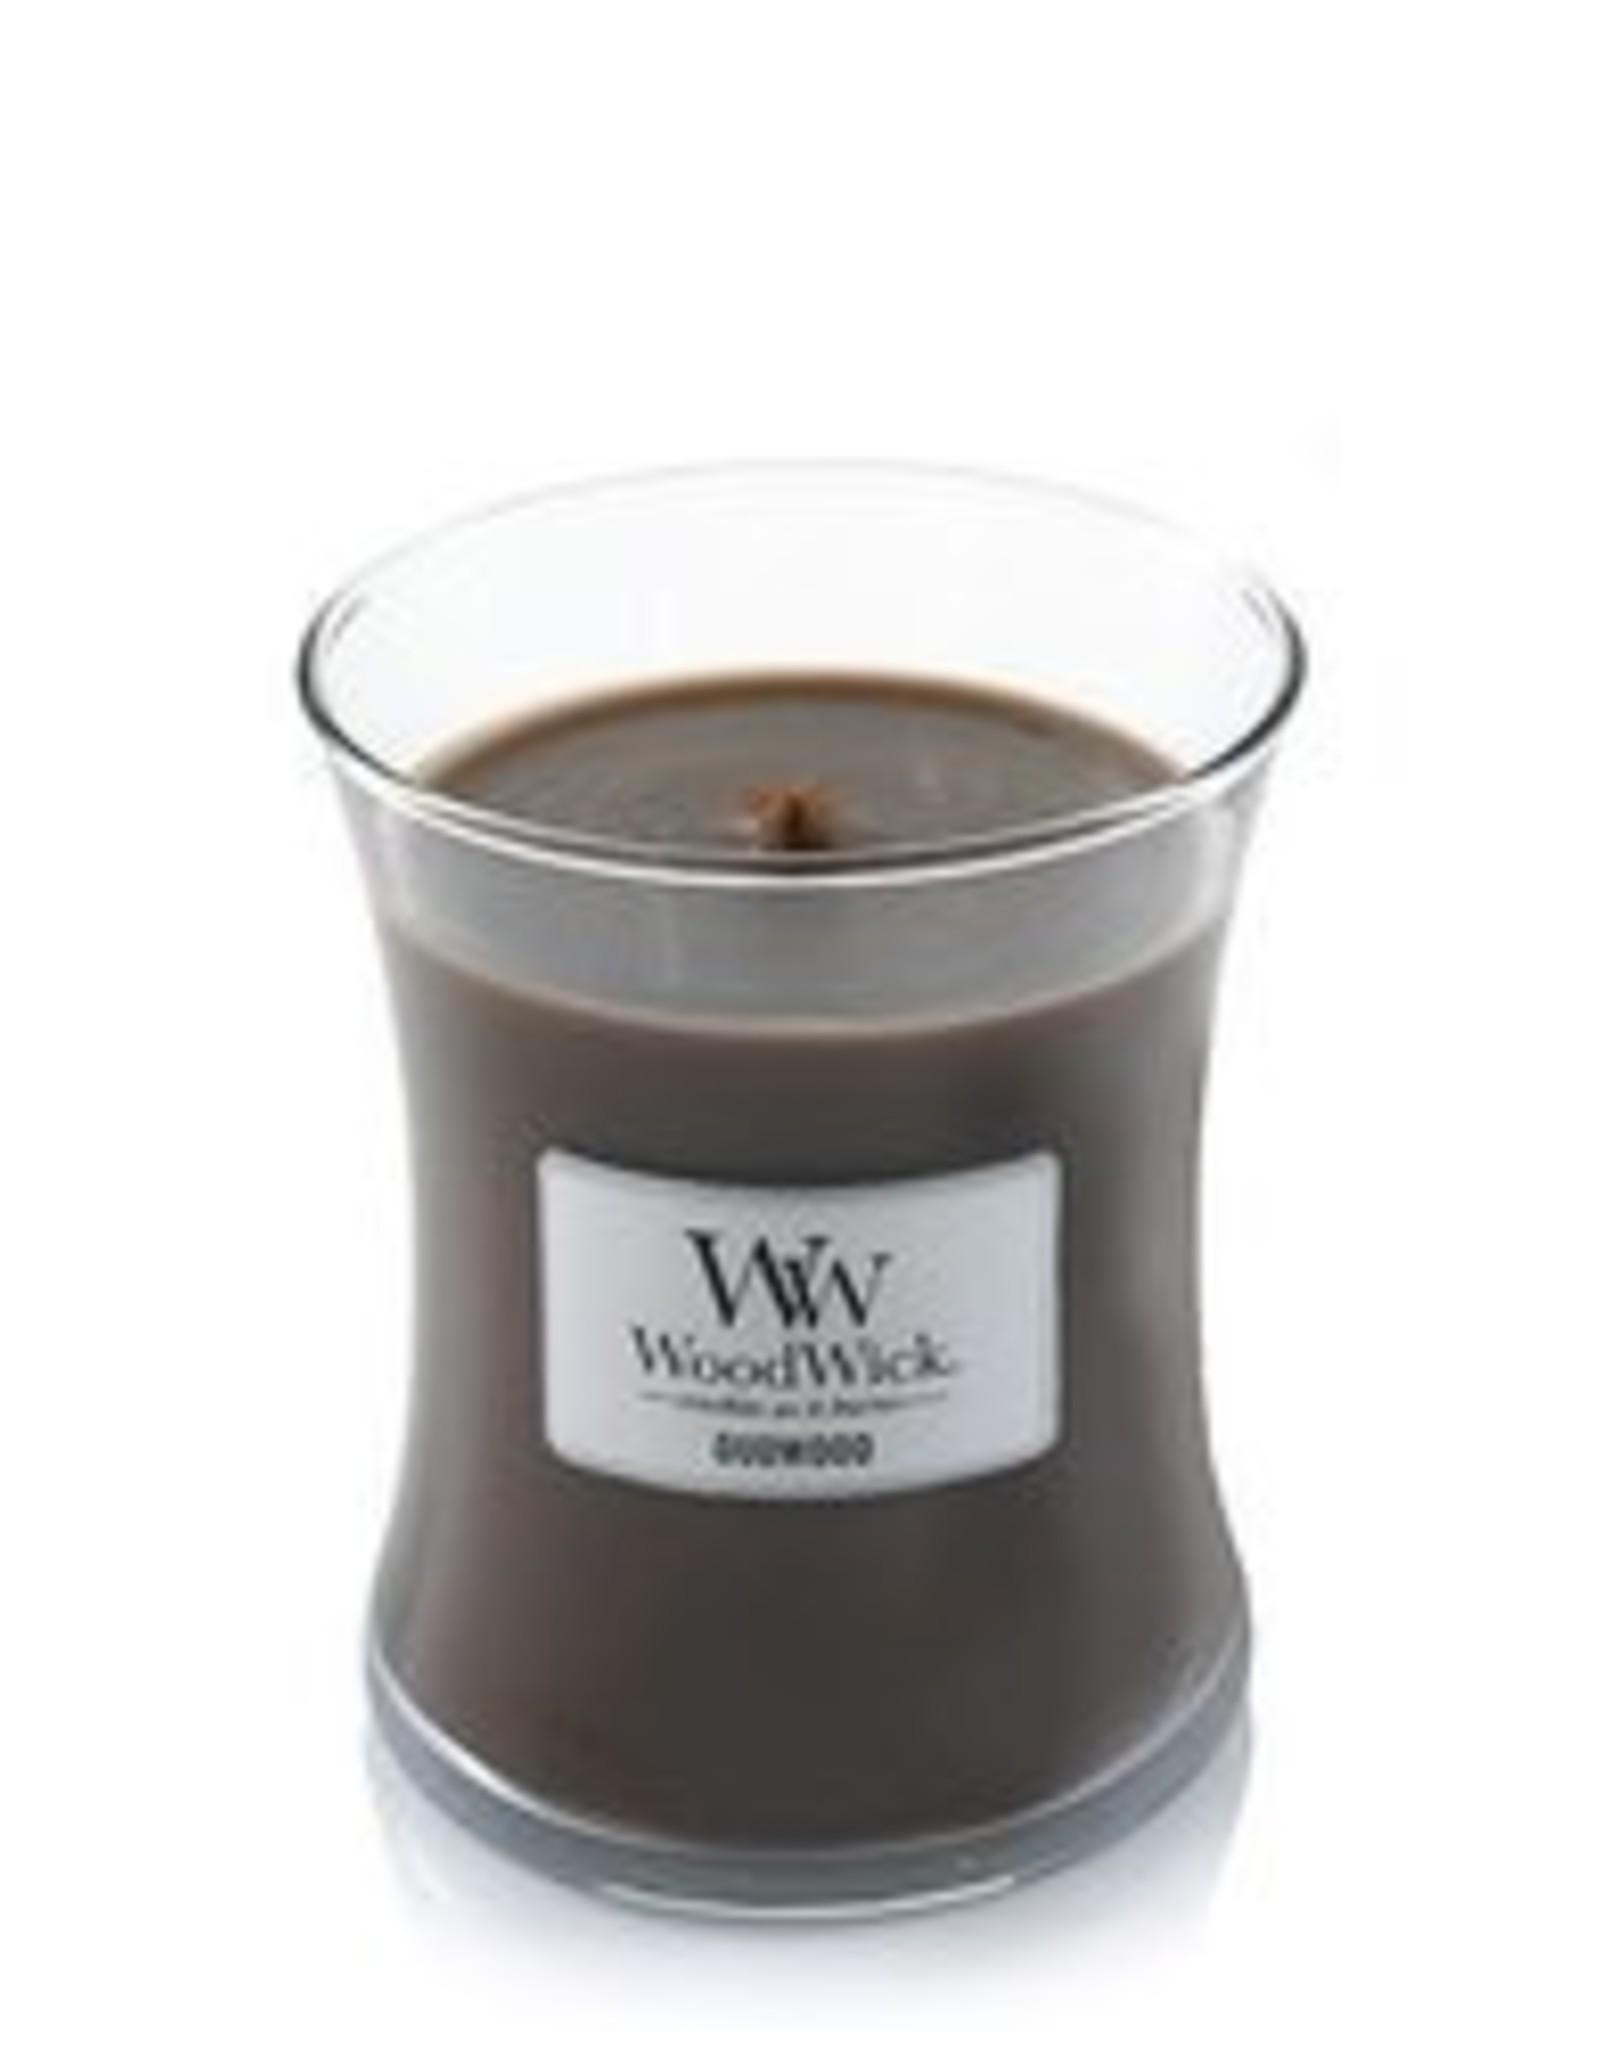 Woodwick Woodwick Oudwood Medium Candle